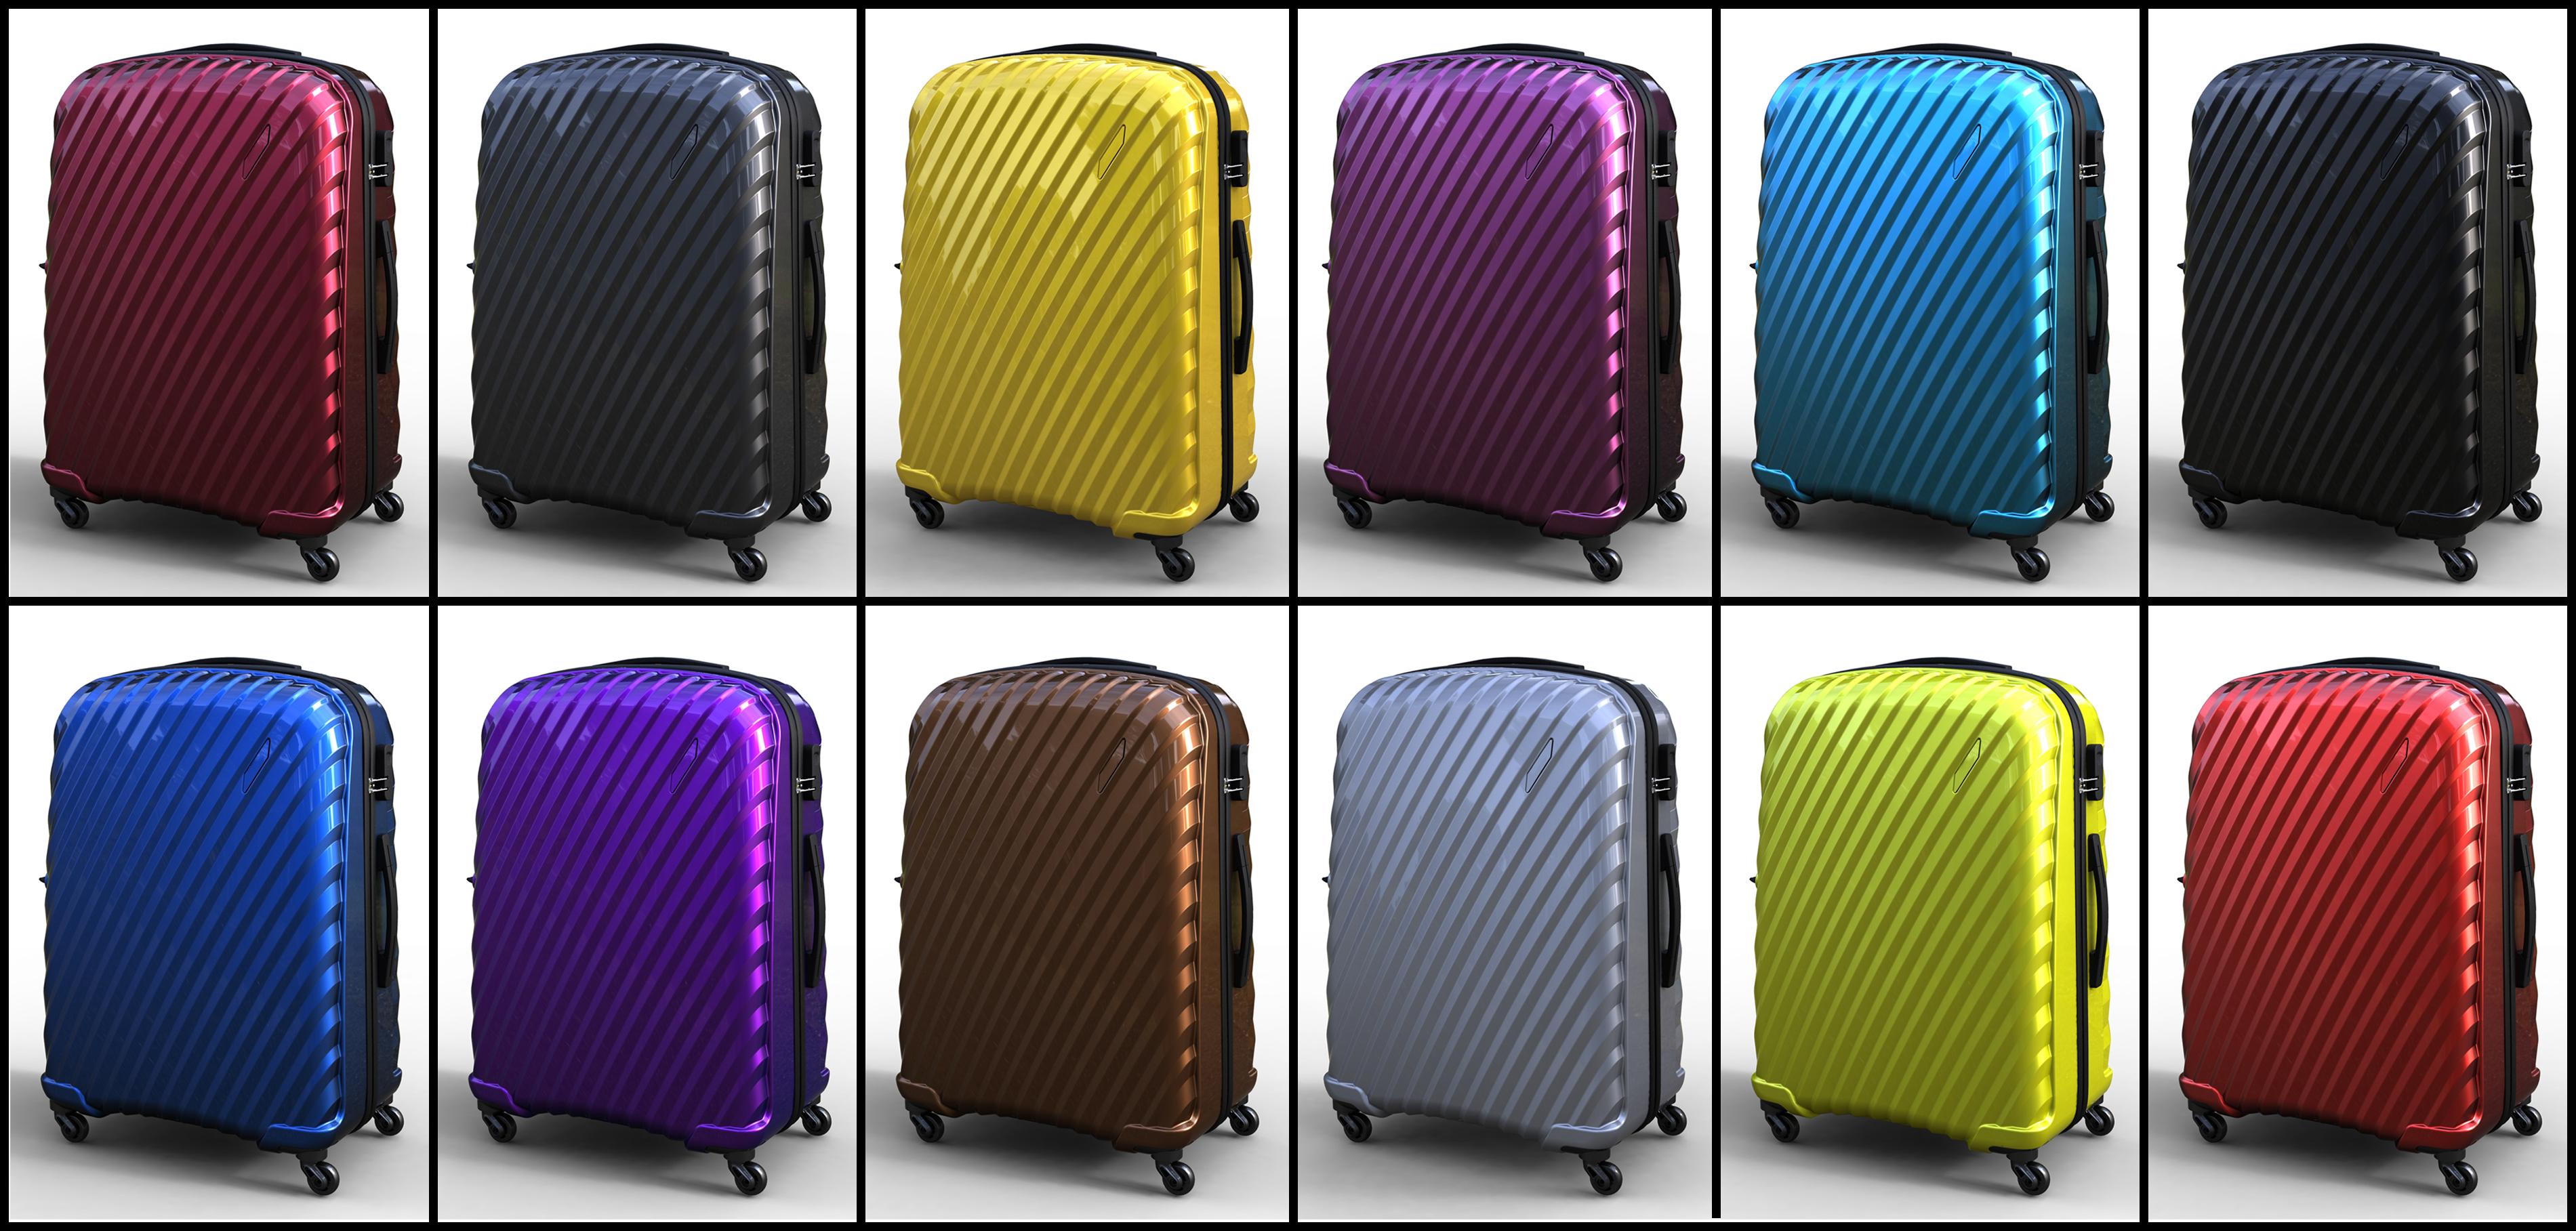 Trolley Suitcase Bag 03 3d model max fbx ma mb obj 285994